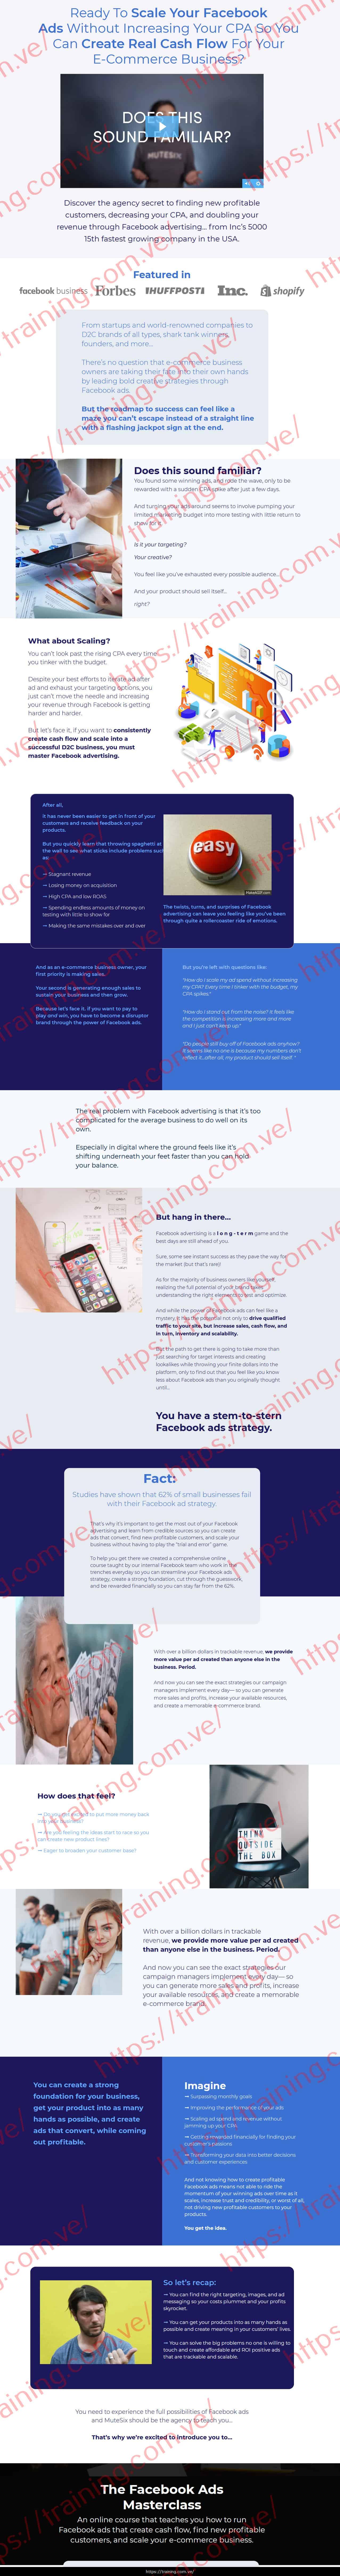 MuteSix Facebook Ads Masterclass Sales page